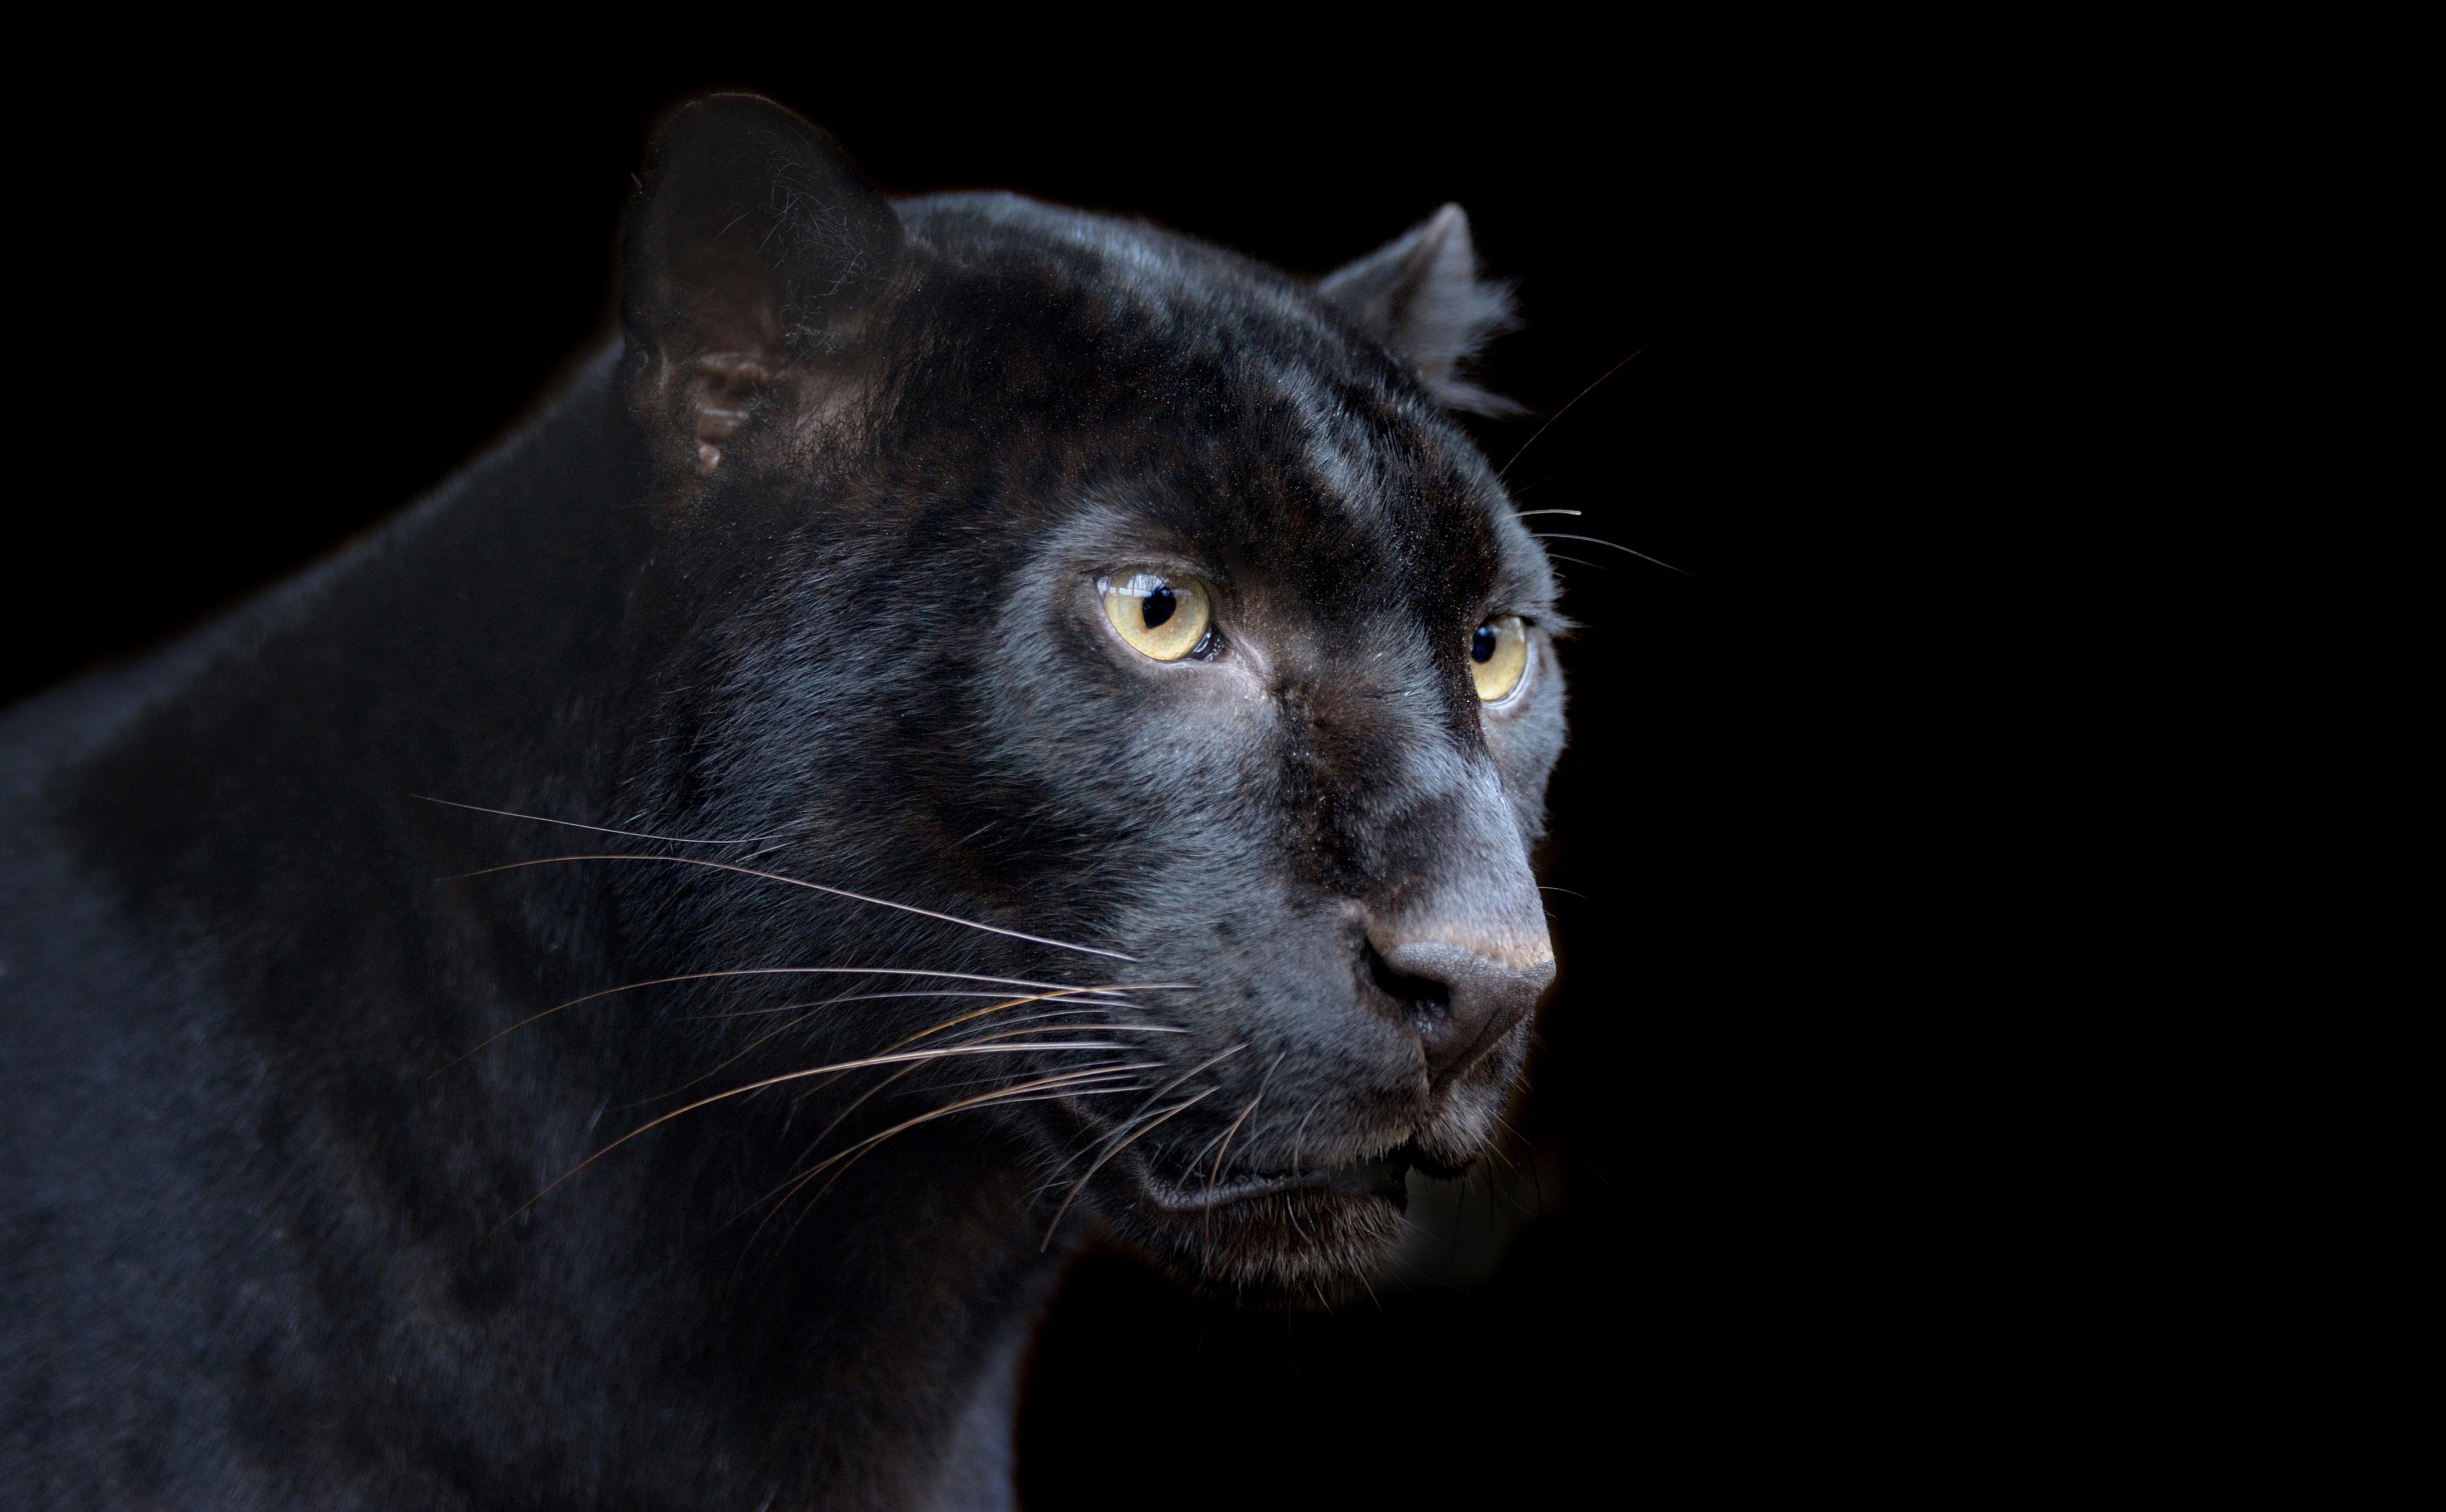 Panther leopard wolf black background wallpaper   ForWallpapercom 6470x4000